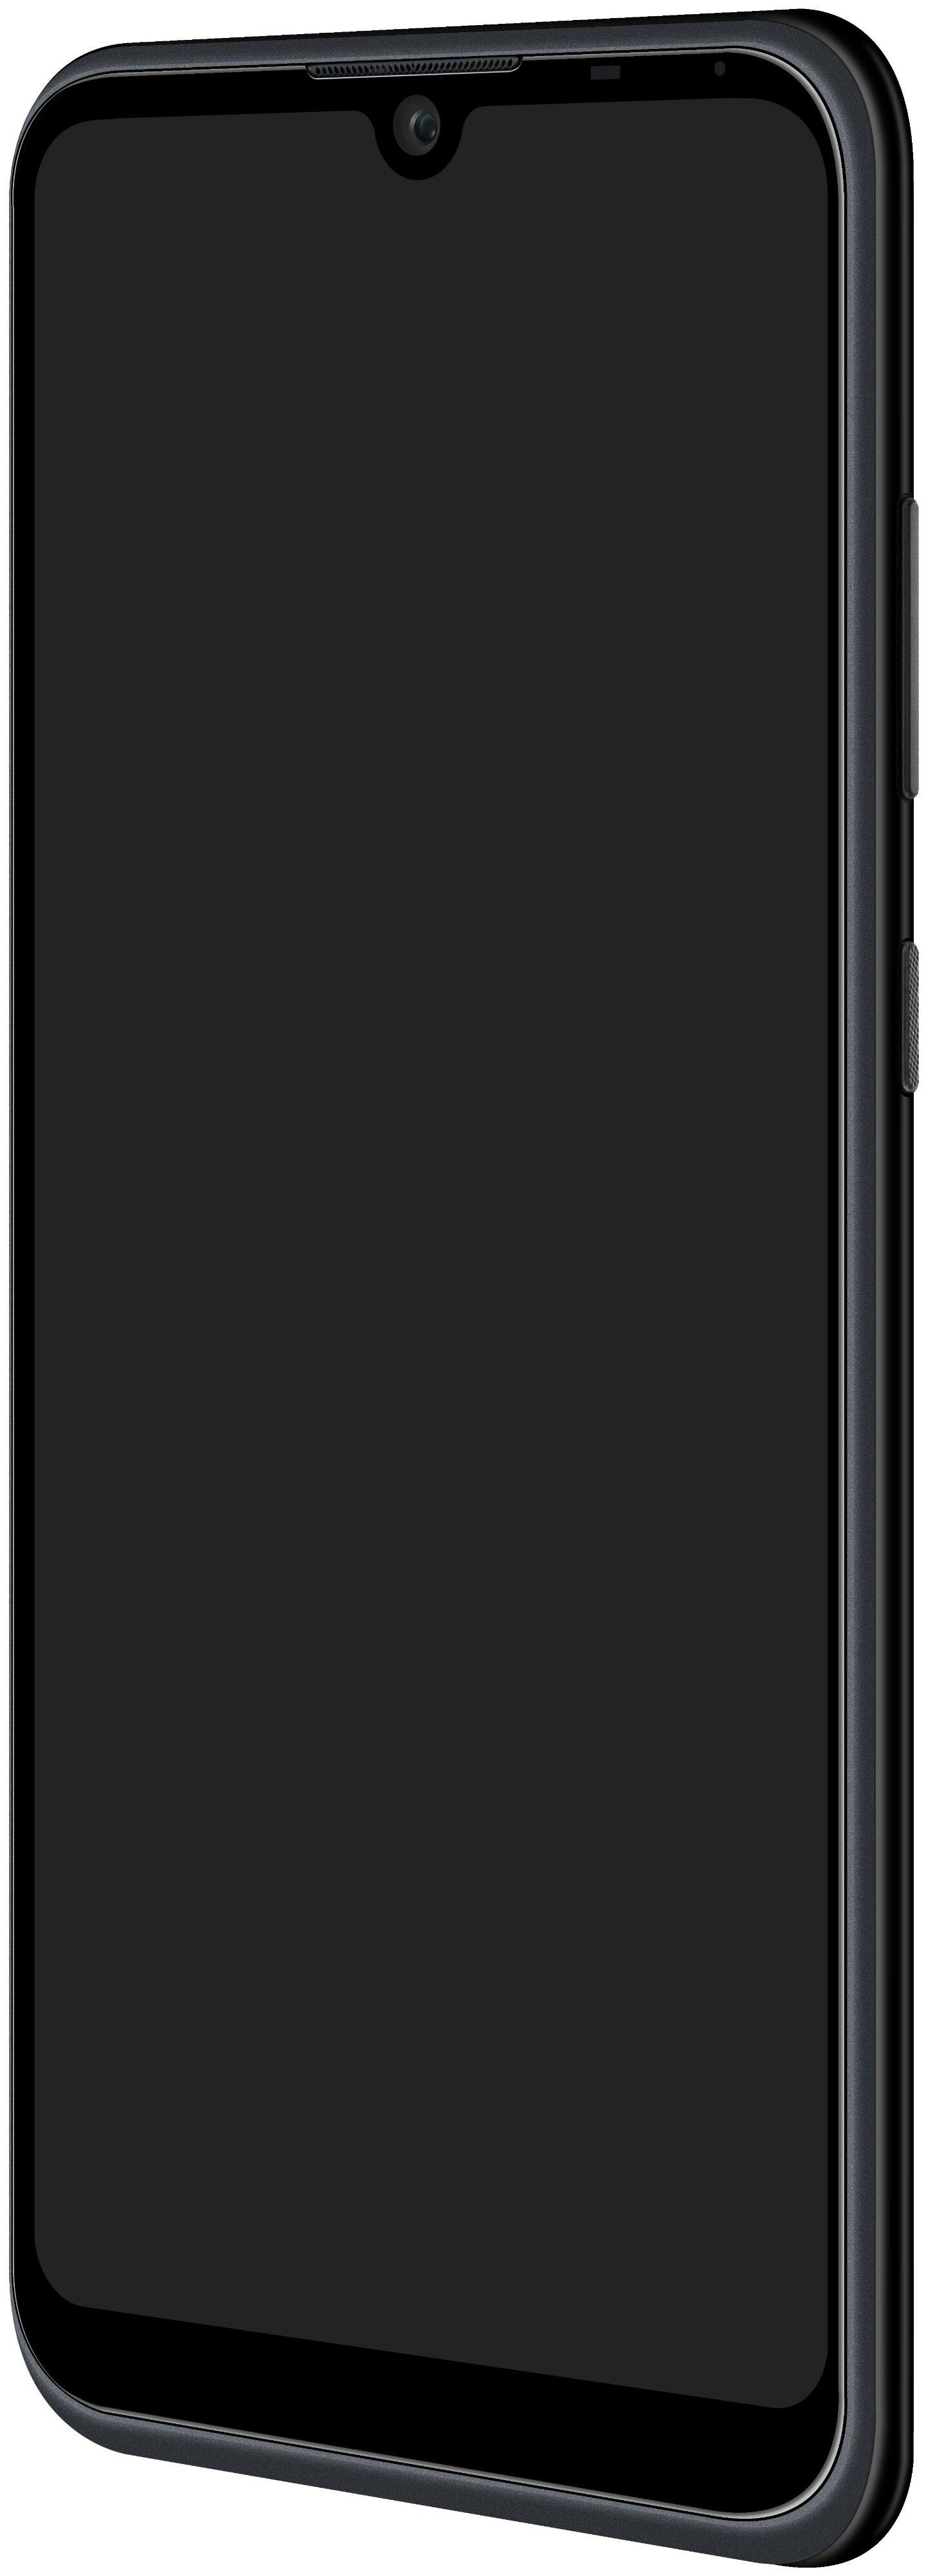 ZTE Blade A5 (2020) 2/32GB - память: 32ГБ, слот для карты памяти